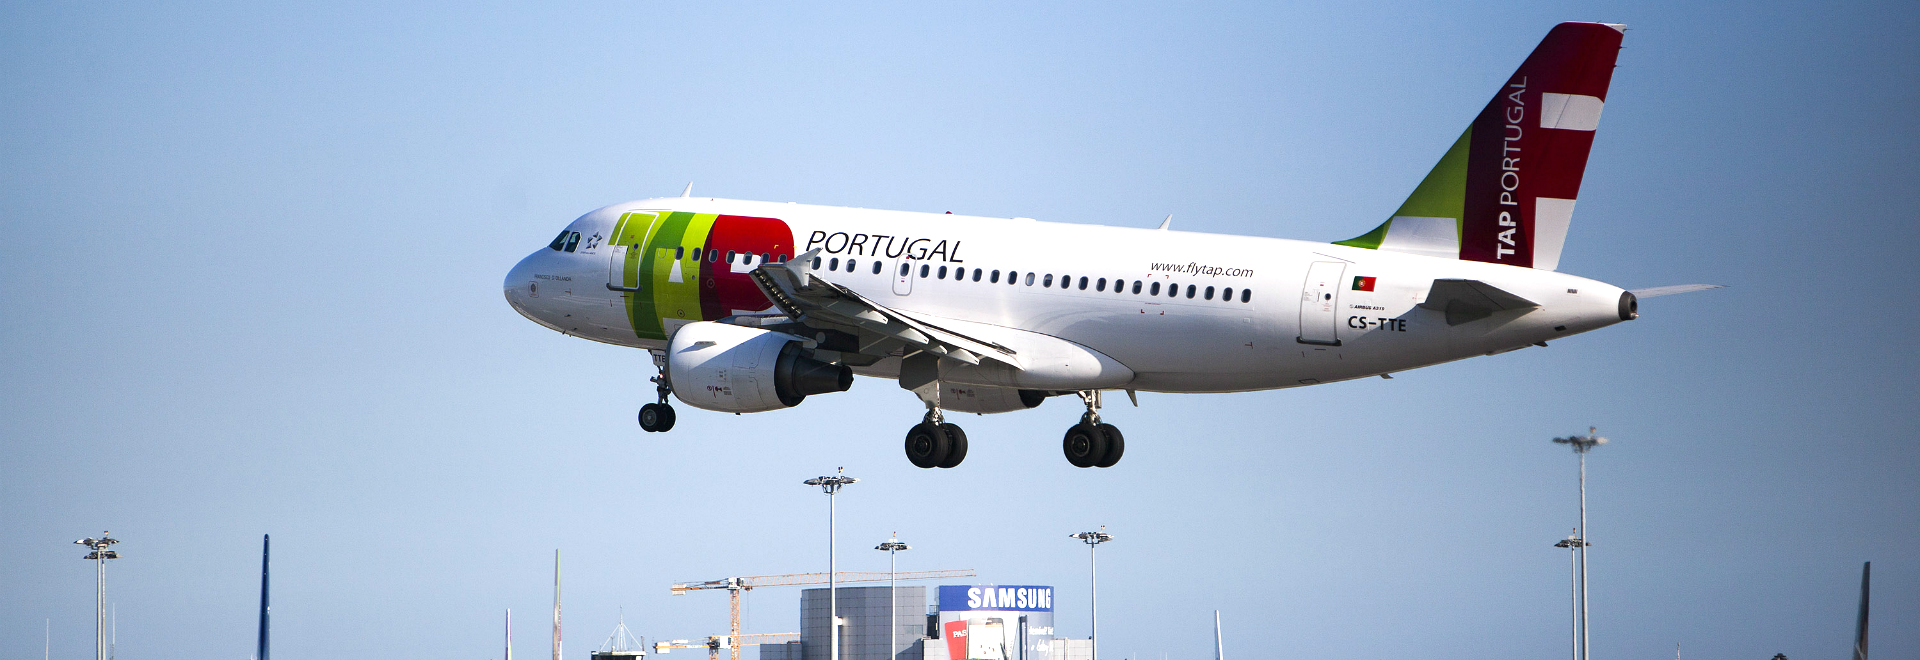 Transfert Lisbonne Aeroport Centre Ville